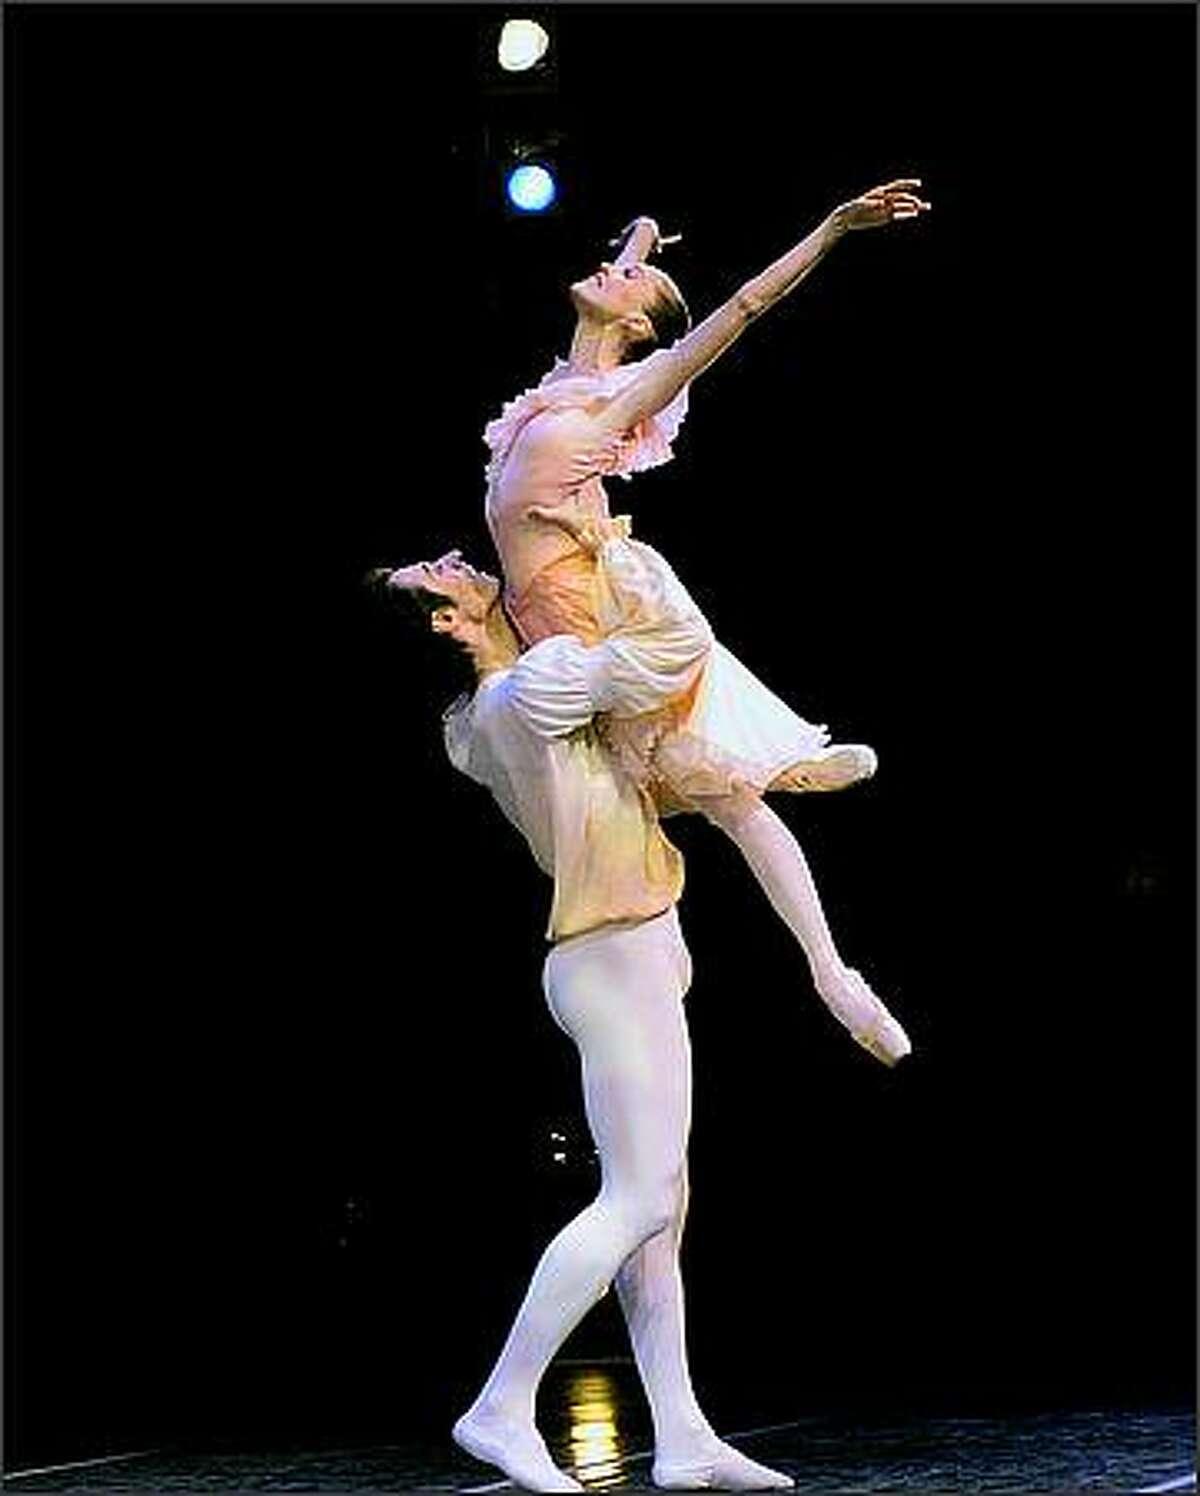 Pacific Northwest Ballet principal dancer Louise Nadeau with former PNB principal Christophe Maraval in George Balanchine's Brahms-Schoenberg Quartet.